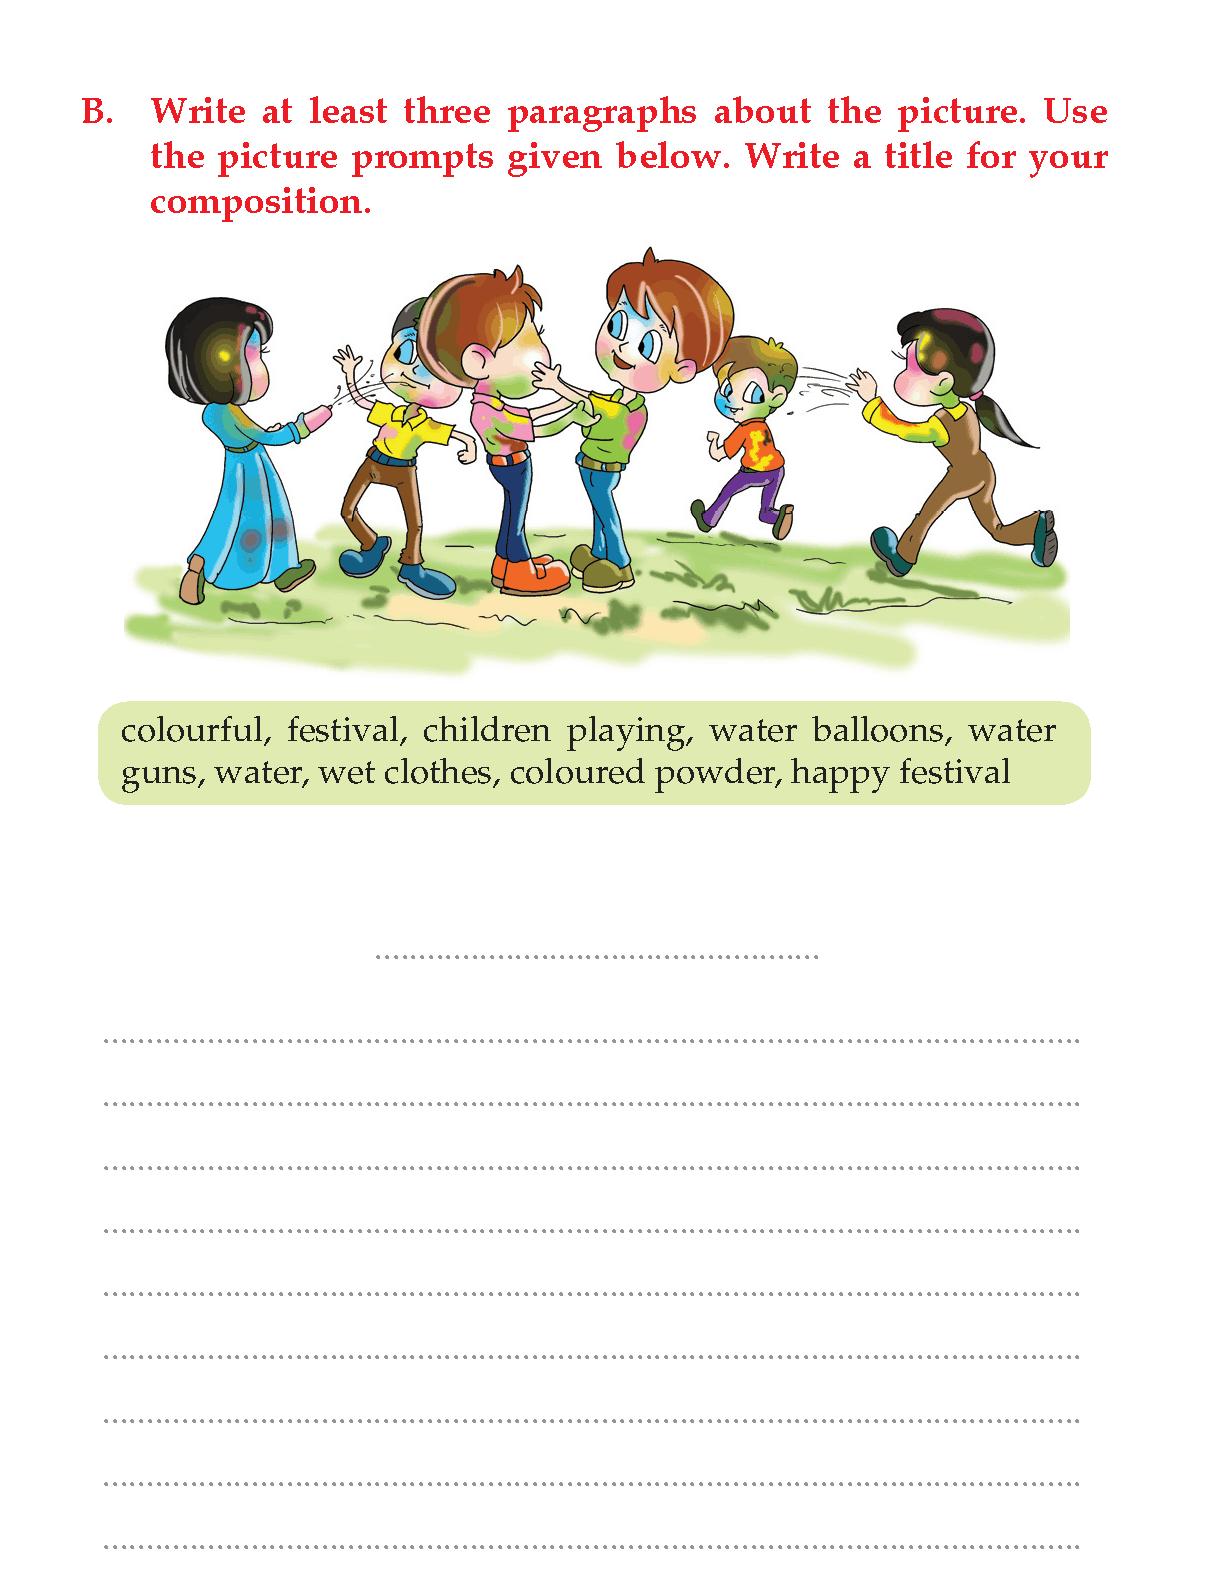 Grade 3 Picture Composition